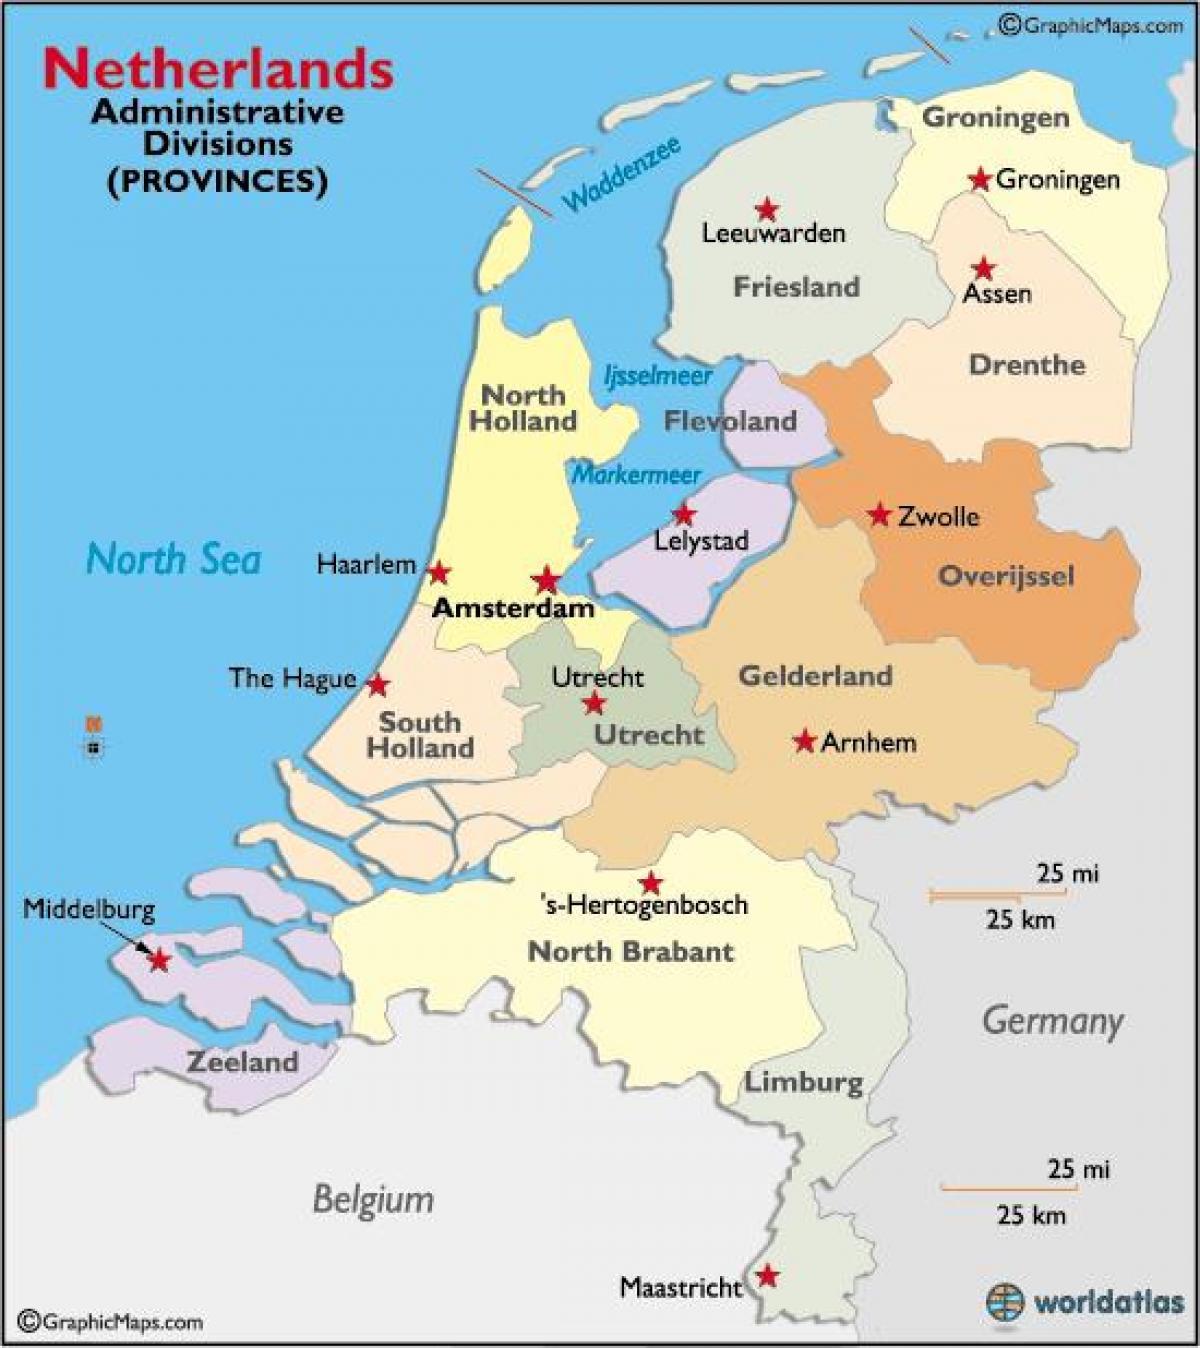 karte holland regionen Holland Regionen Landkarte   Karte von Holland Regionen